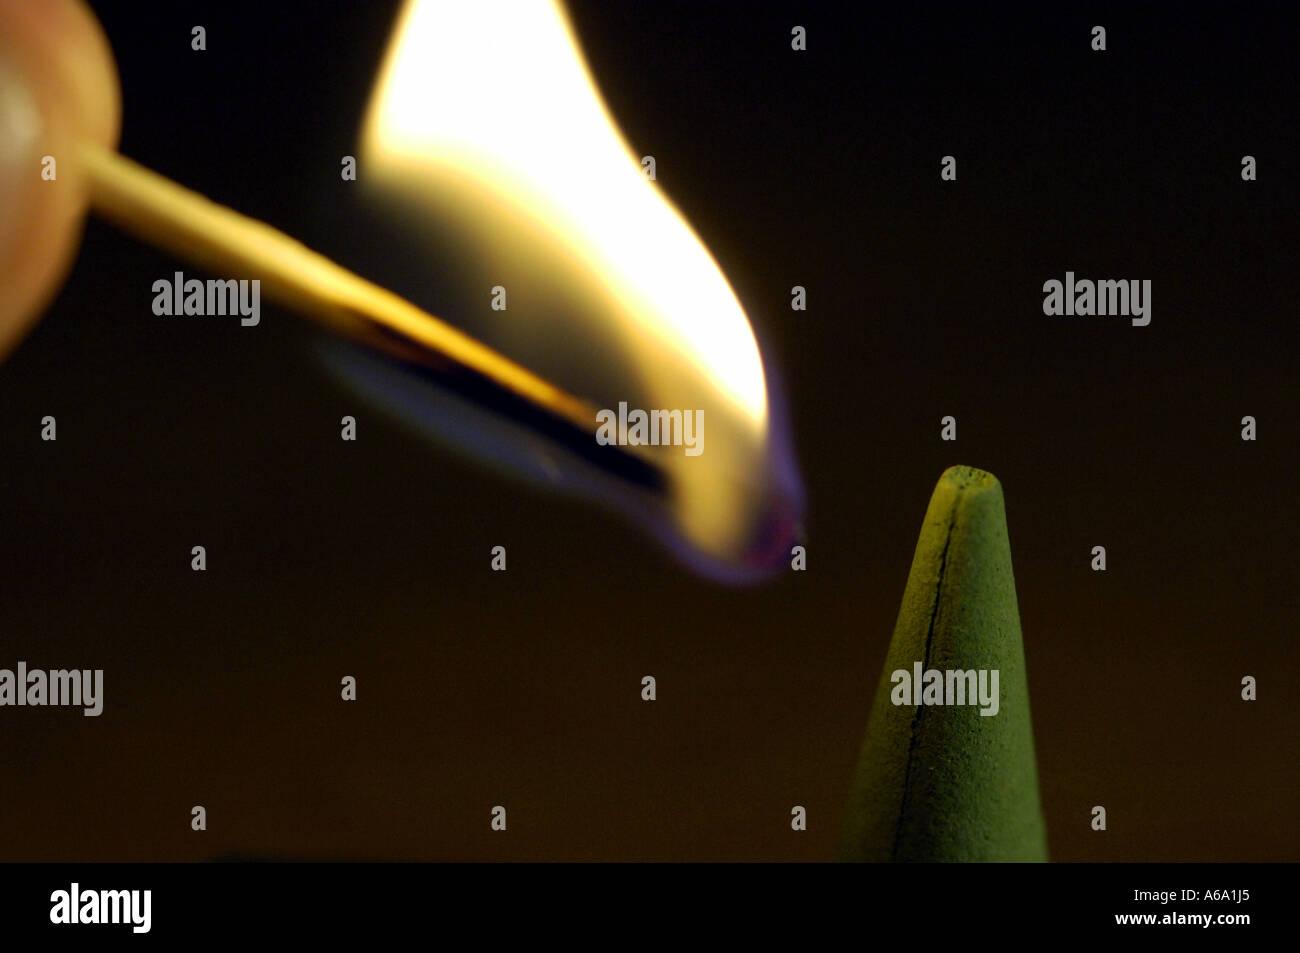 Match Matchstick Fuoco Di Fiamma Di Combustione Bruciano